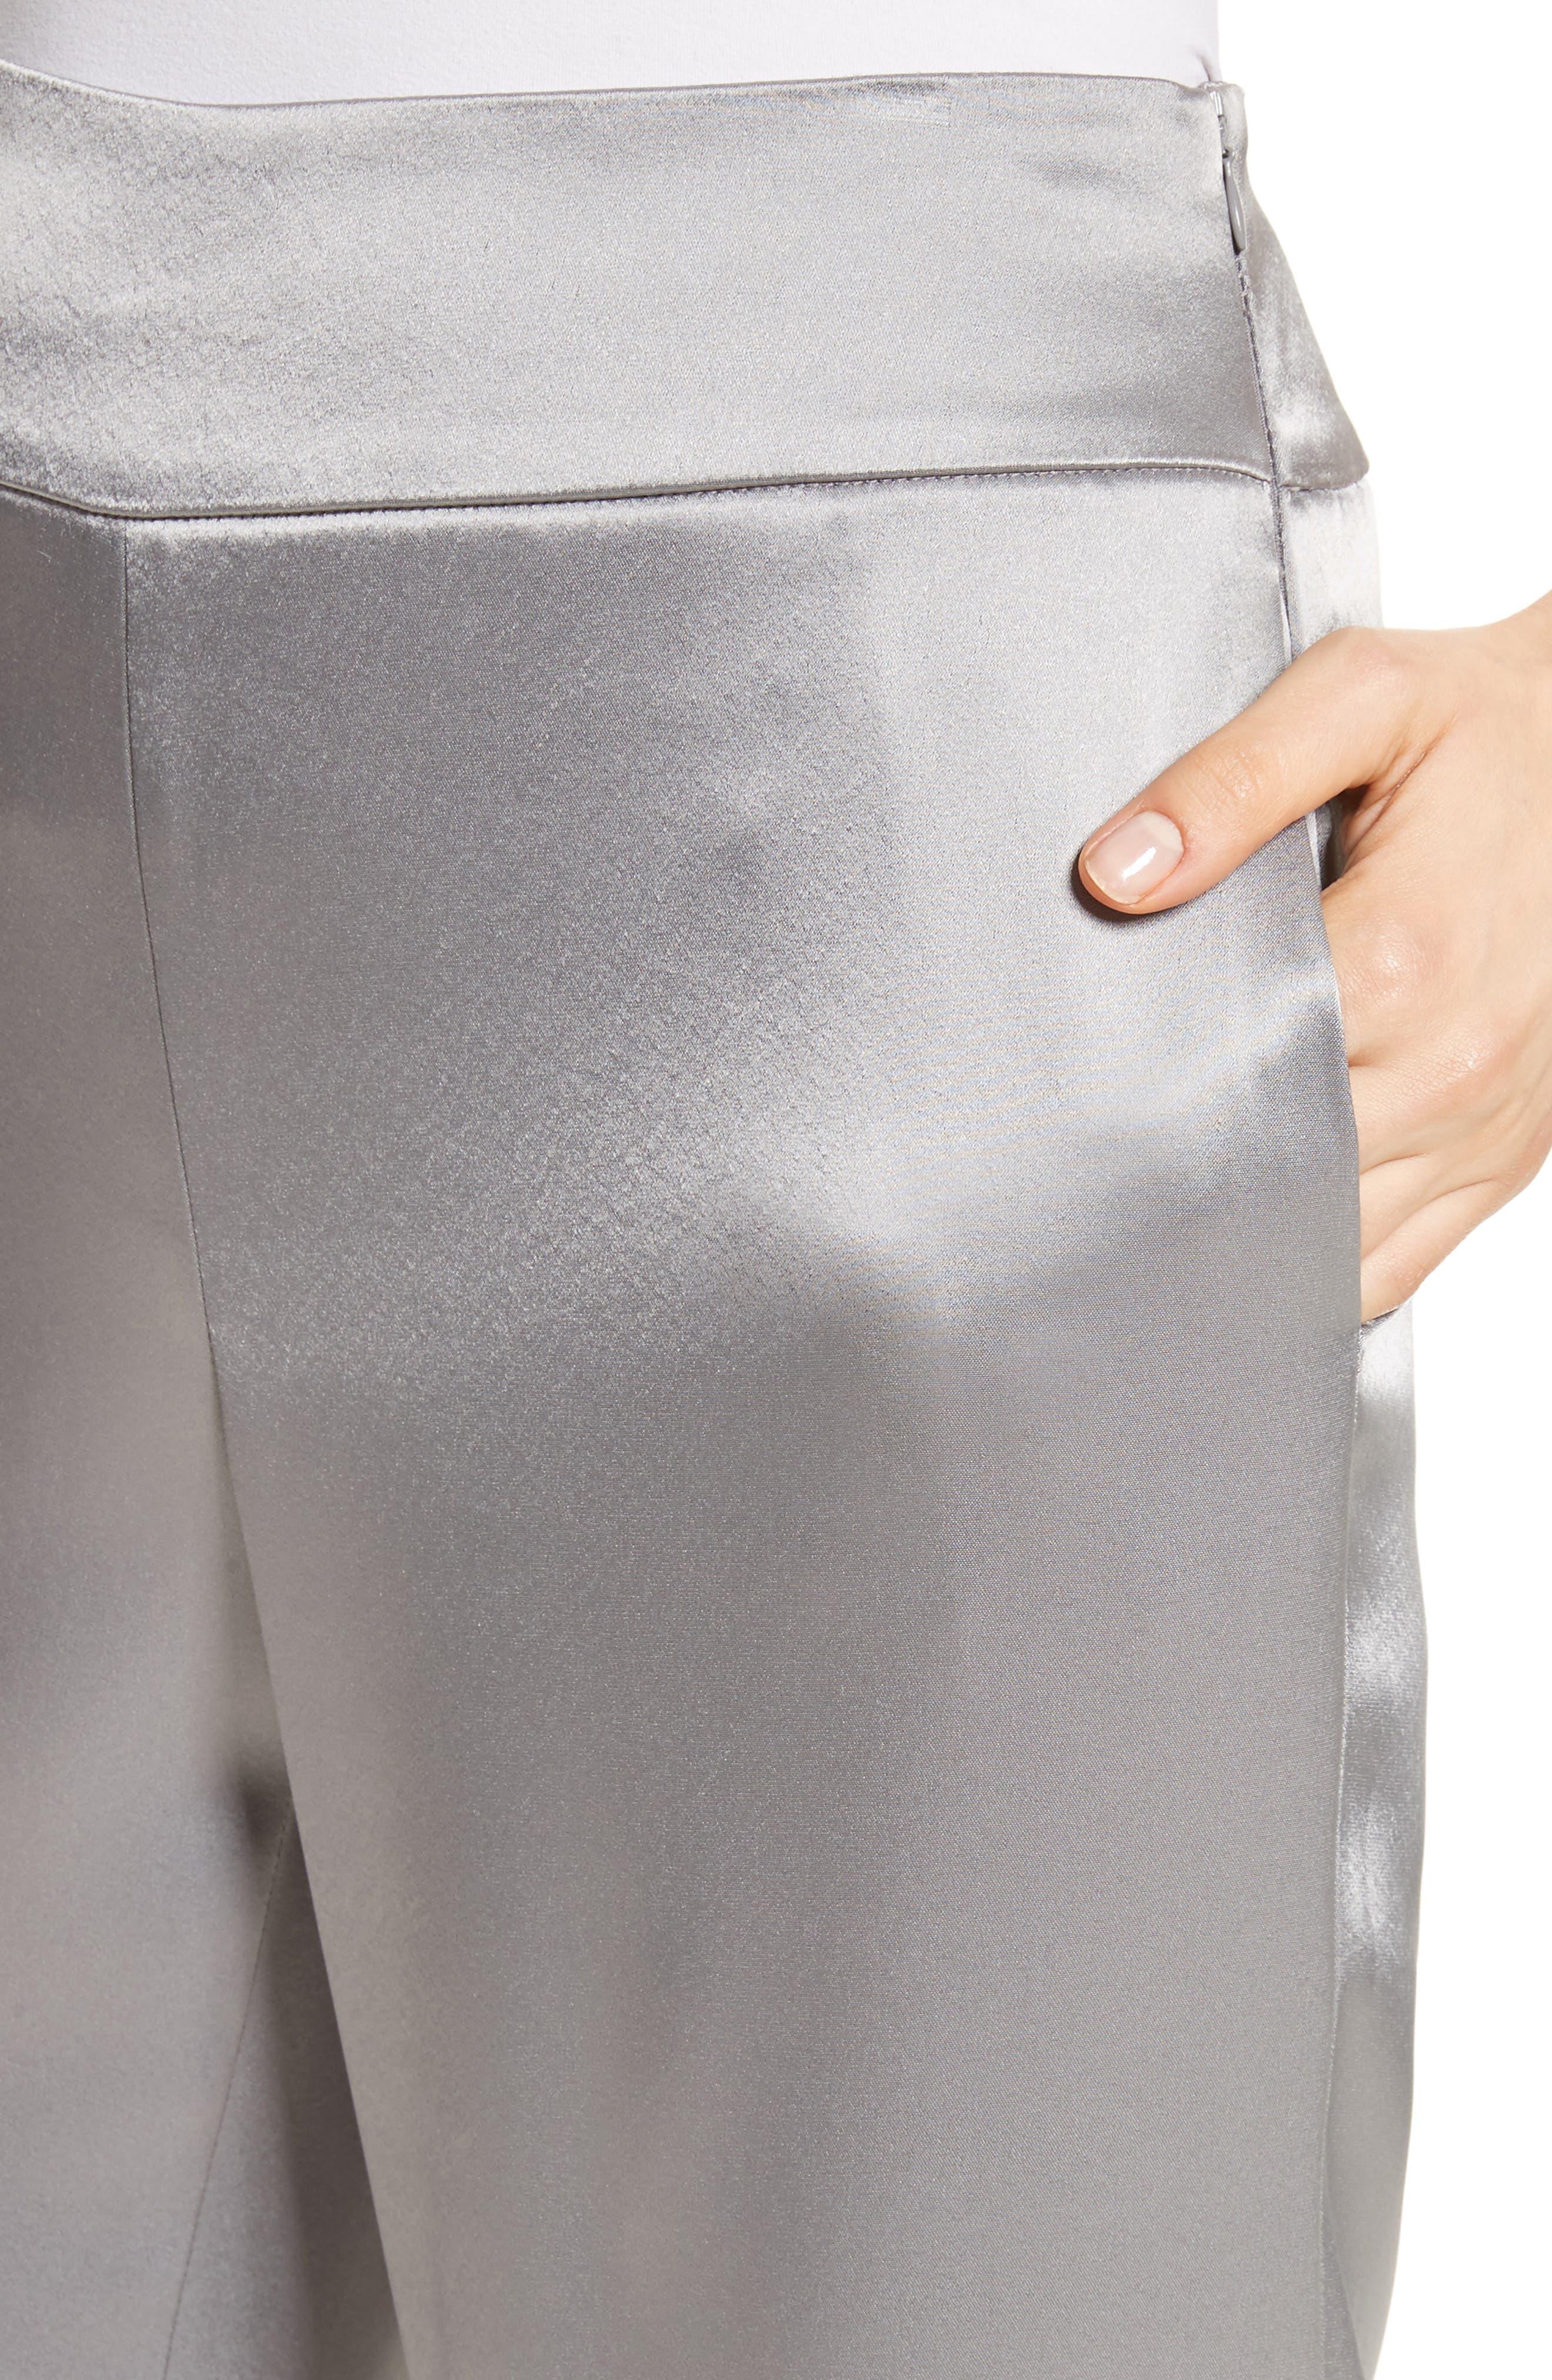 Liquid Satin Pants,                             Alternate thumbnail 4, color,                             020